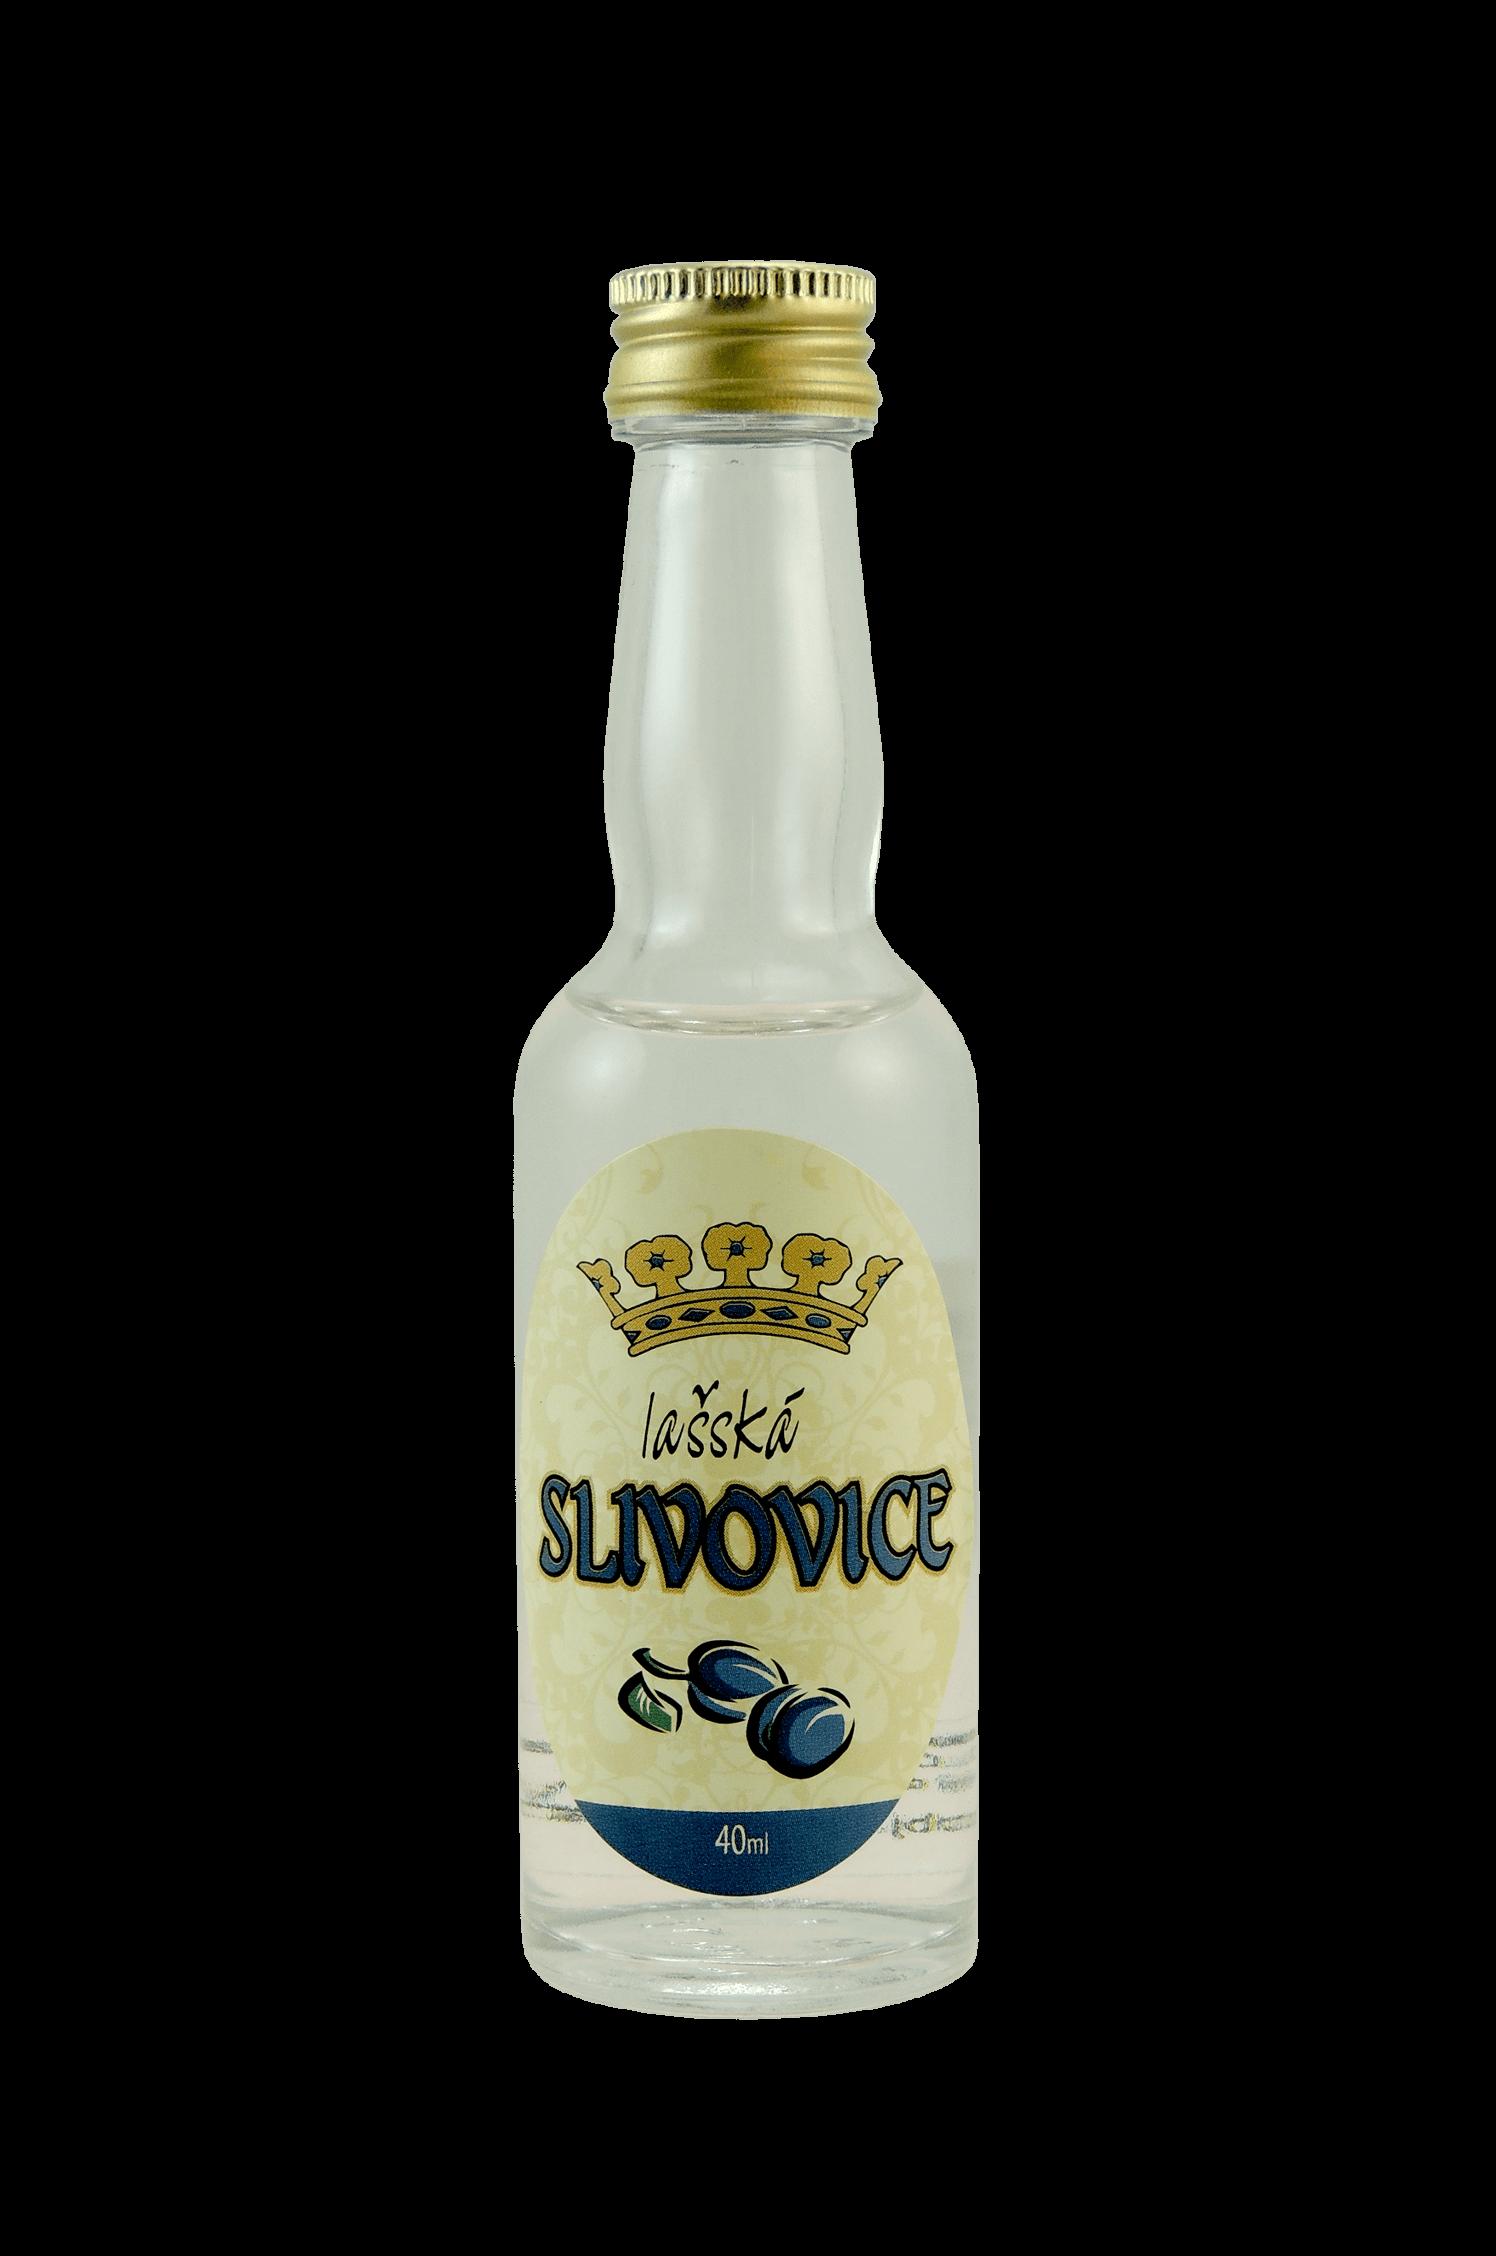 Lašská Slivovice